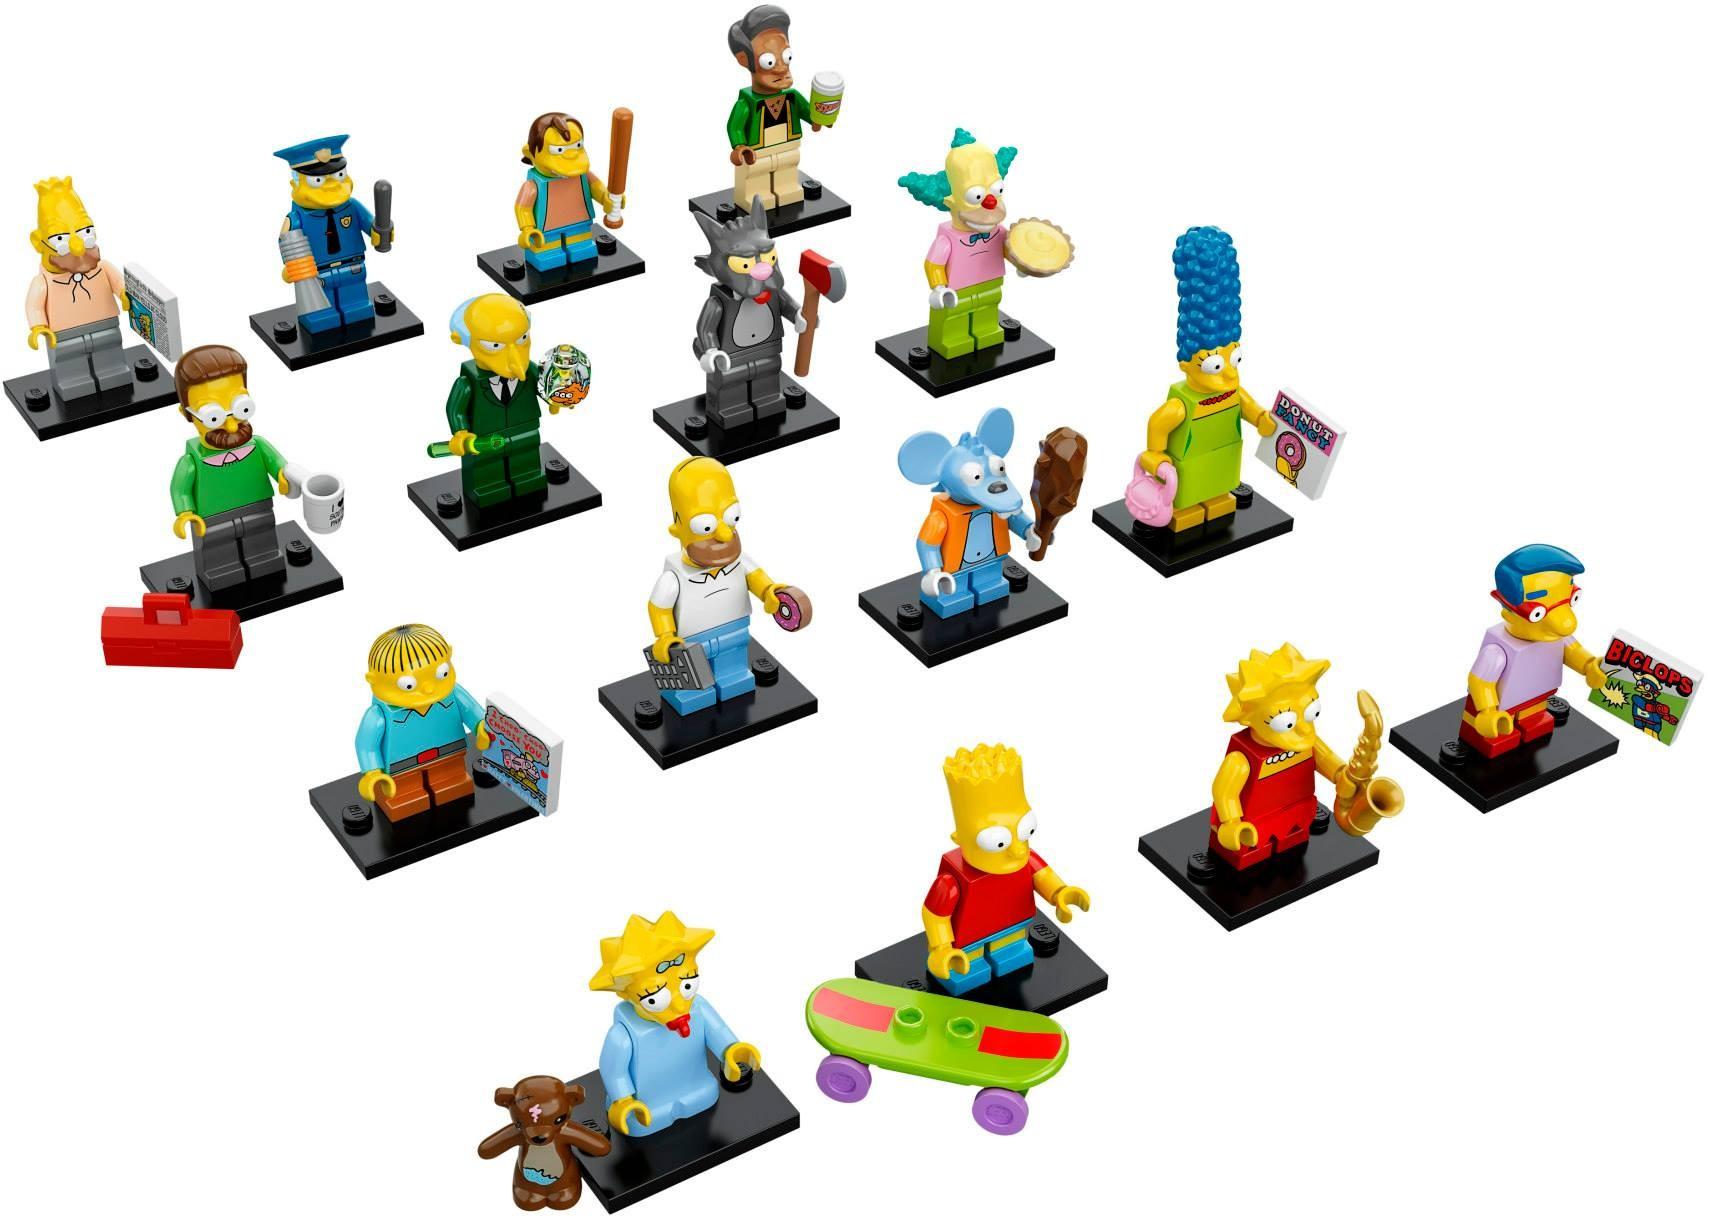 LEGO 71005 - LEGO Simpsons Series 1 Complete Full Set (16 pcs) MISP